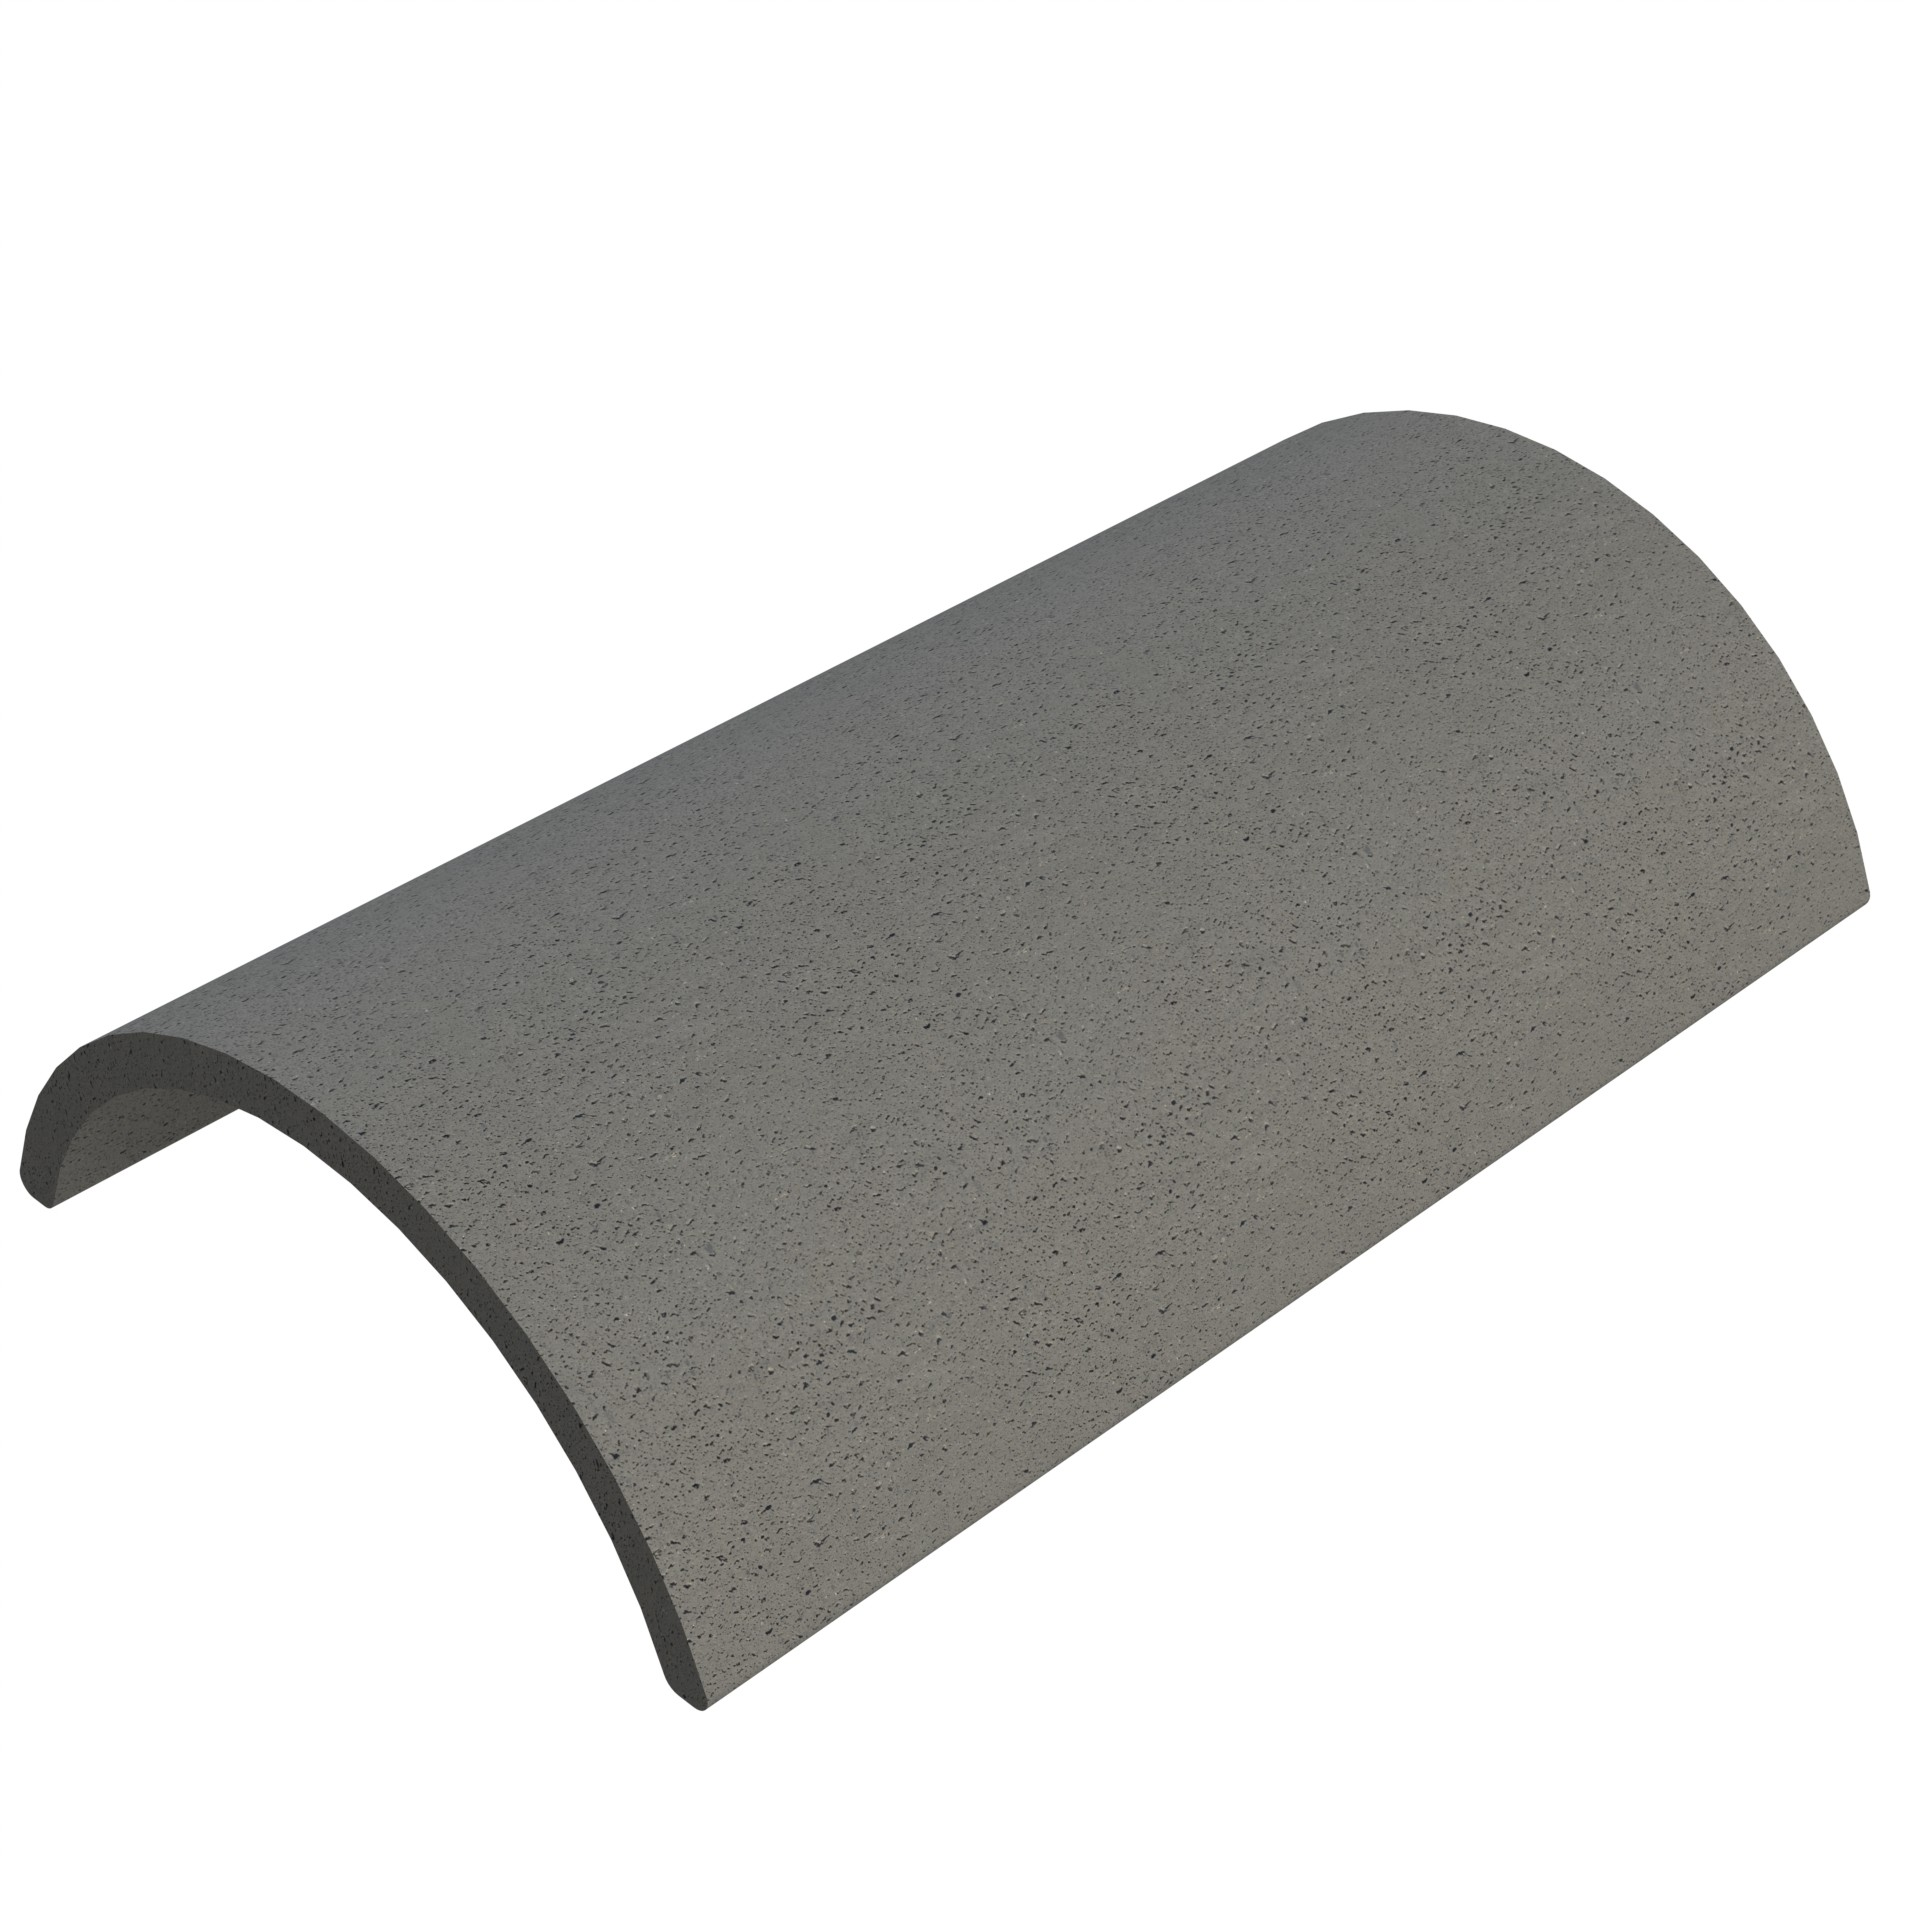 SANDTOFT TILES - Concrete Half Round Ridge